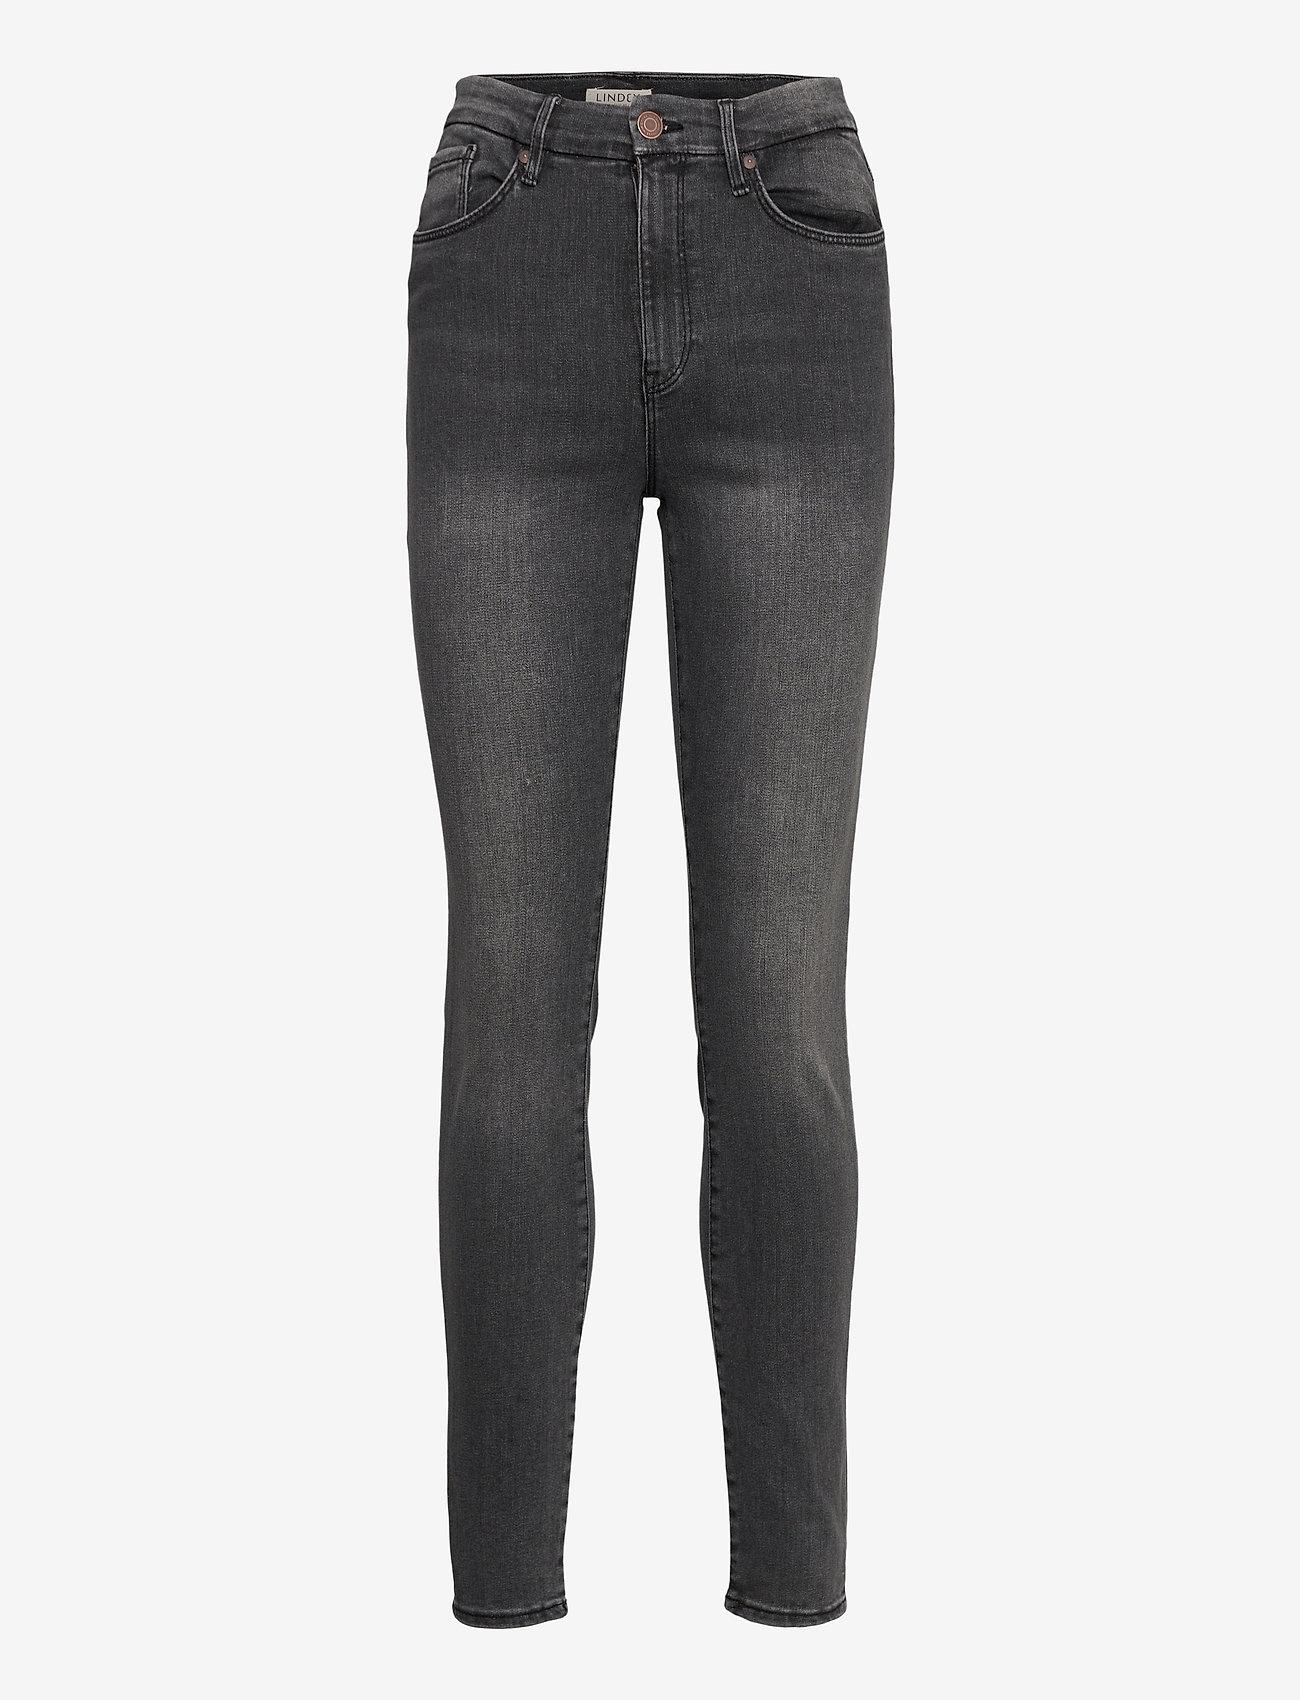 Lindex - Trousers denim Clara black - skinny jeans - black - 0